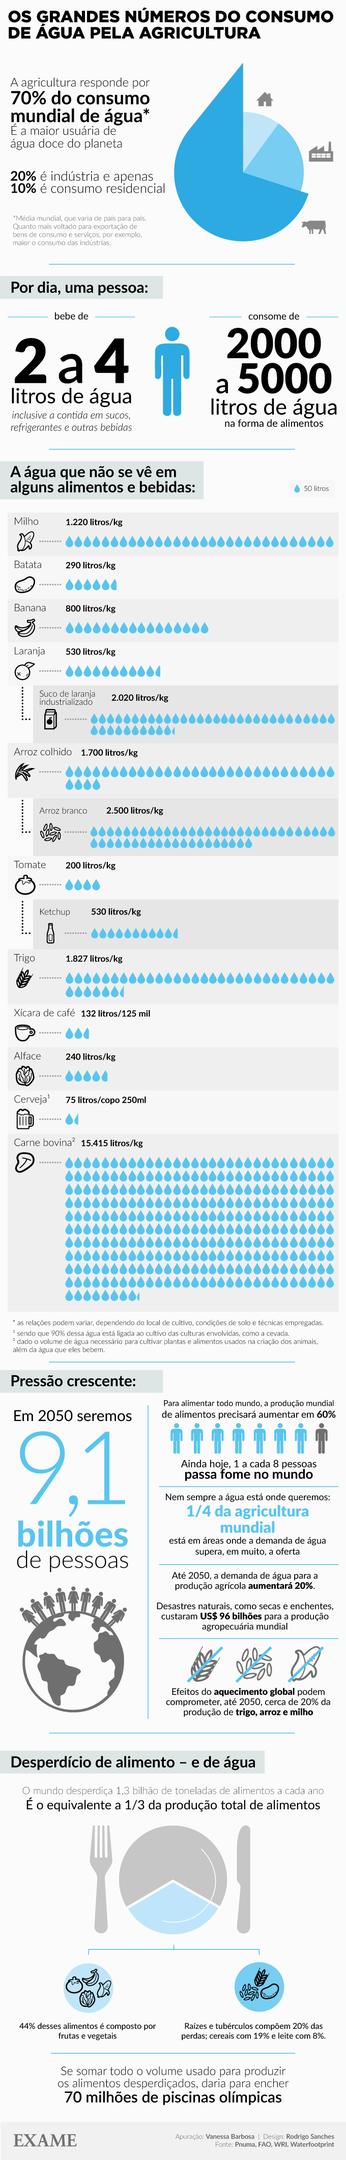 Infográfico sobre o consumo de água na agricultura.